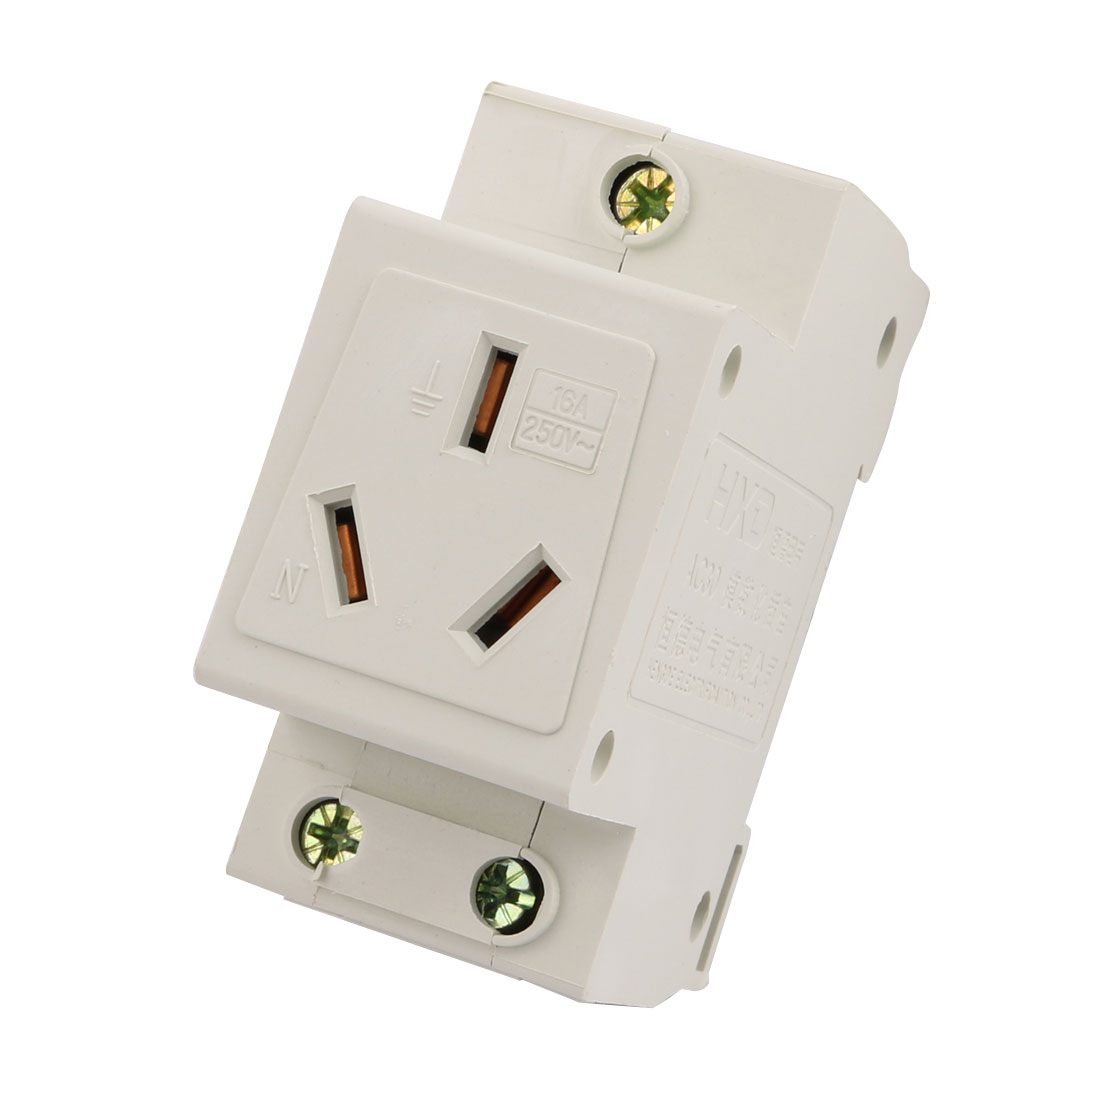 AU Plug AC 250V 16A Amps Single Pole Terminal Electric Modular Socket